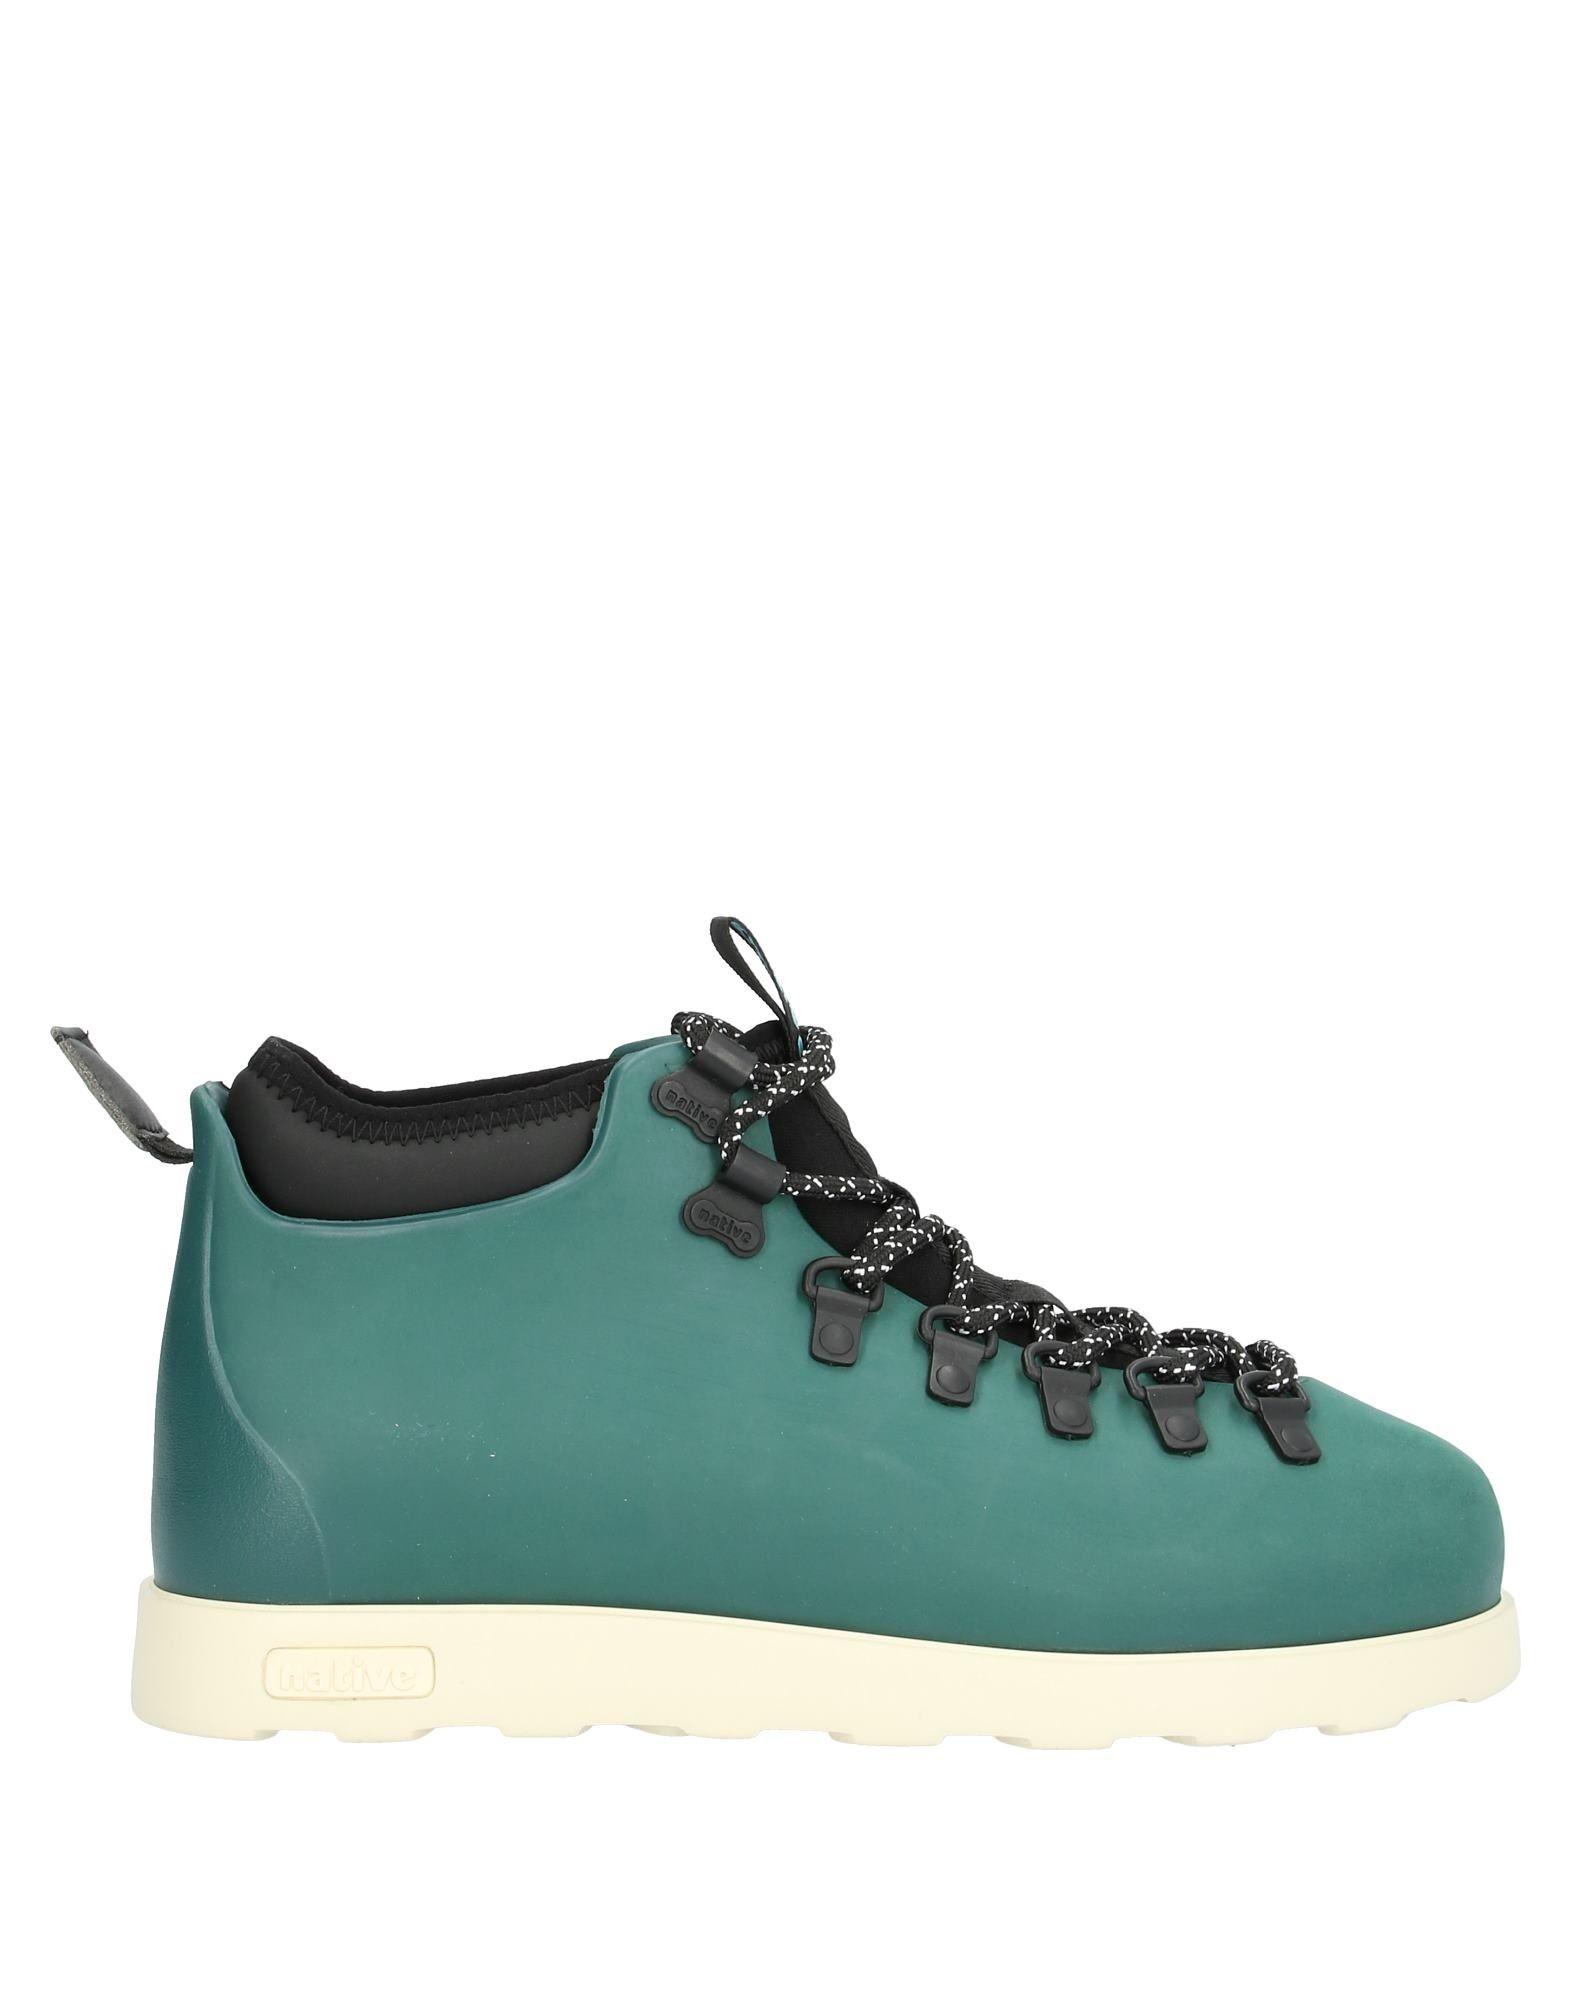 NATIVE Низкие кеды и кроссовки кеды кроссовки низкие native jefferson glass green shell white